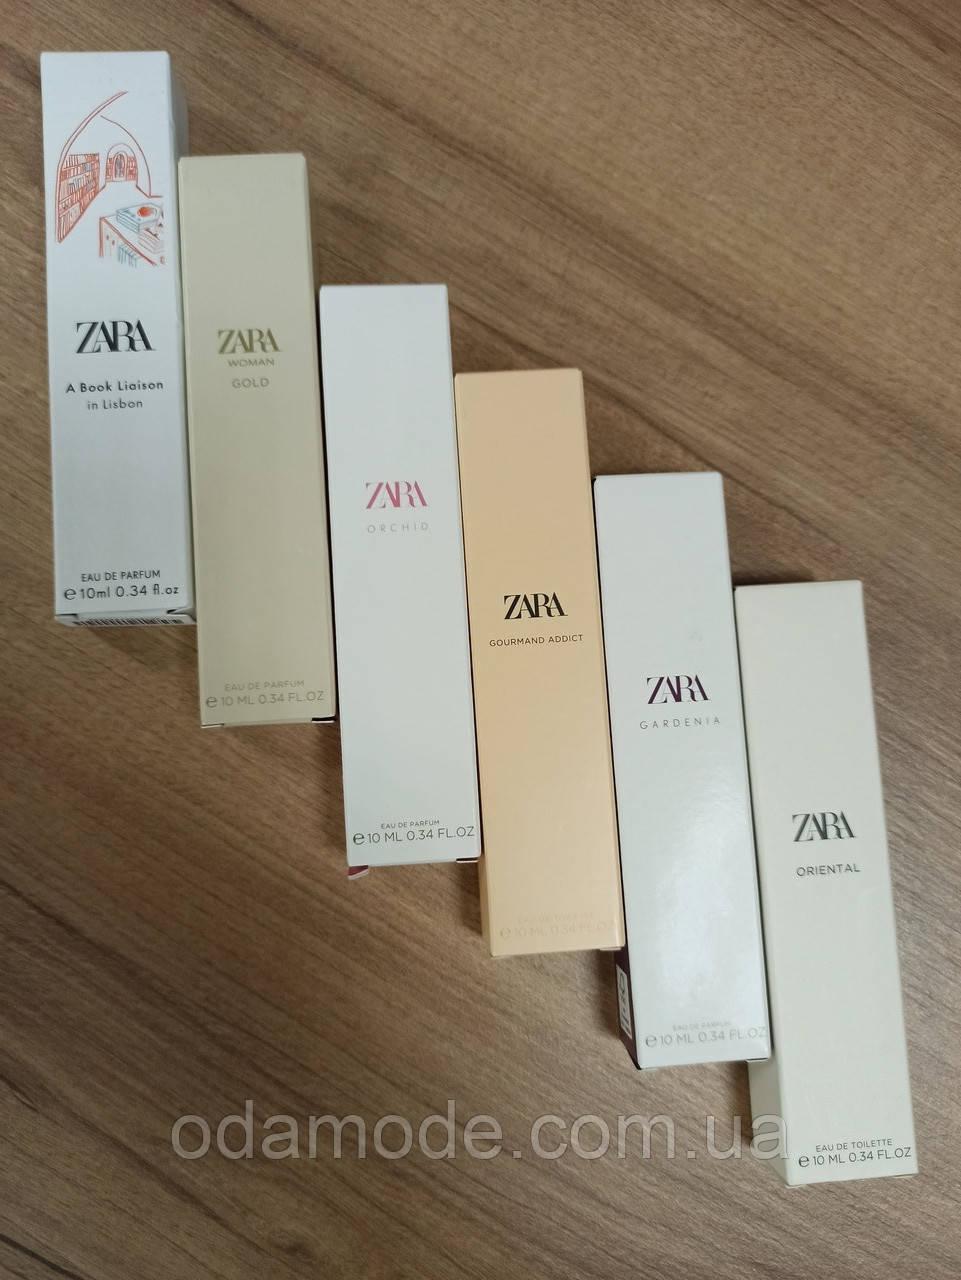 Жіночі парфуми ZARA Gourmand Addict Gardenia Oriental Gold 10ml